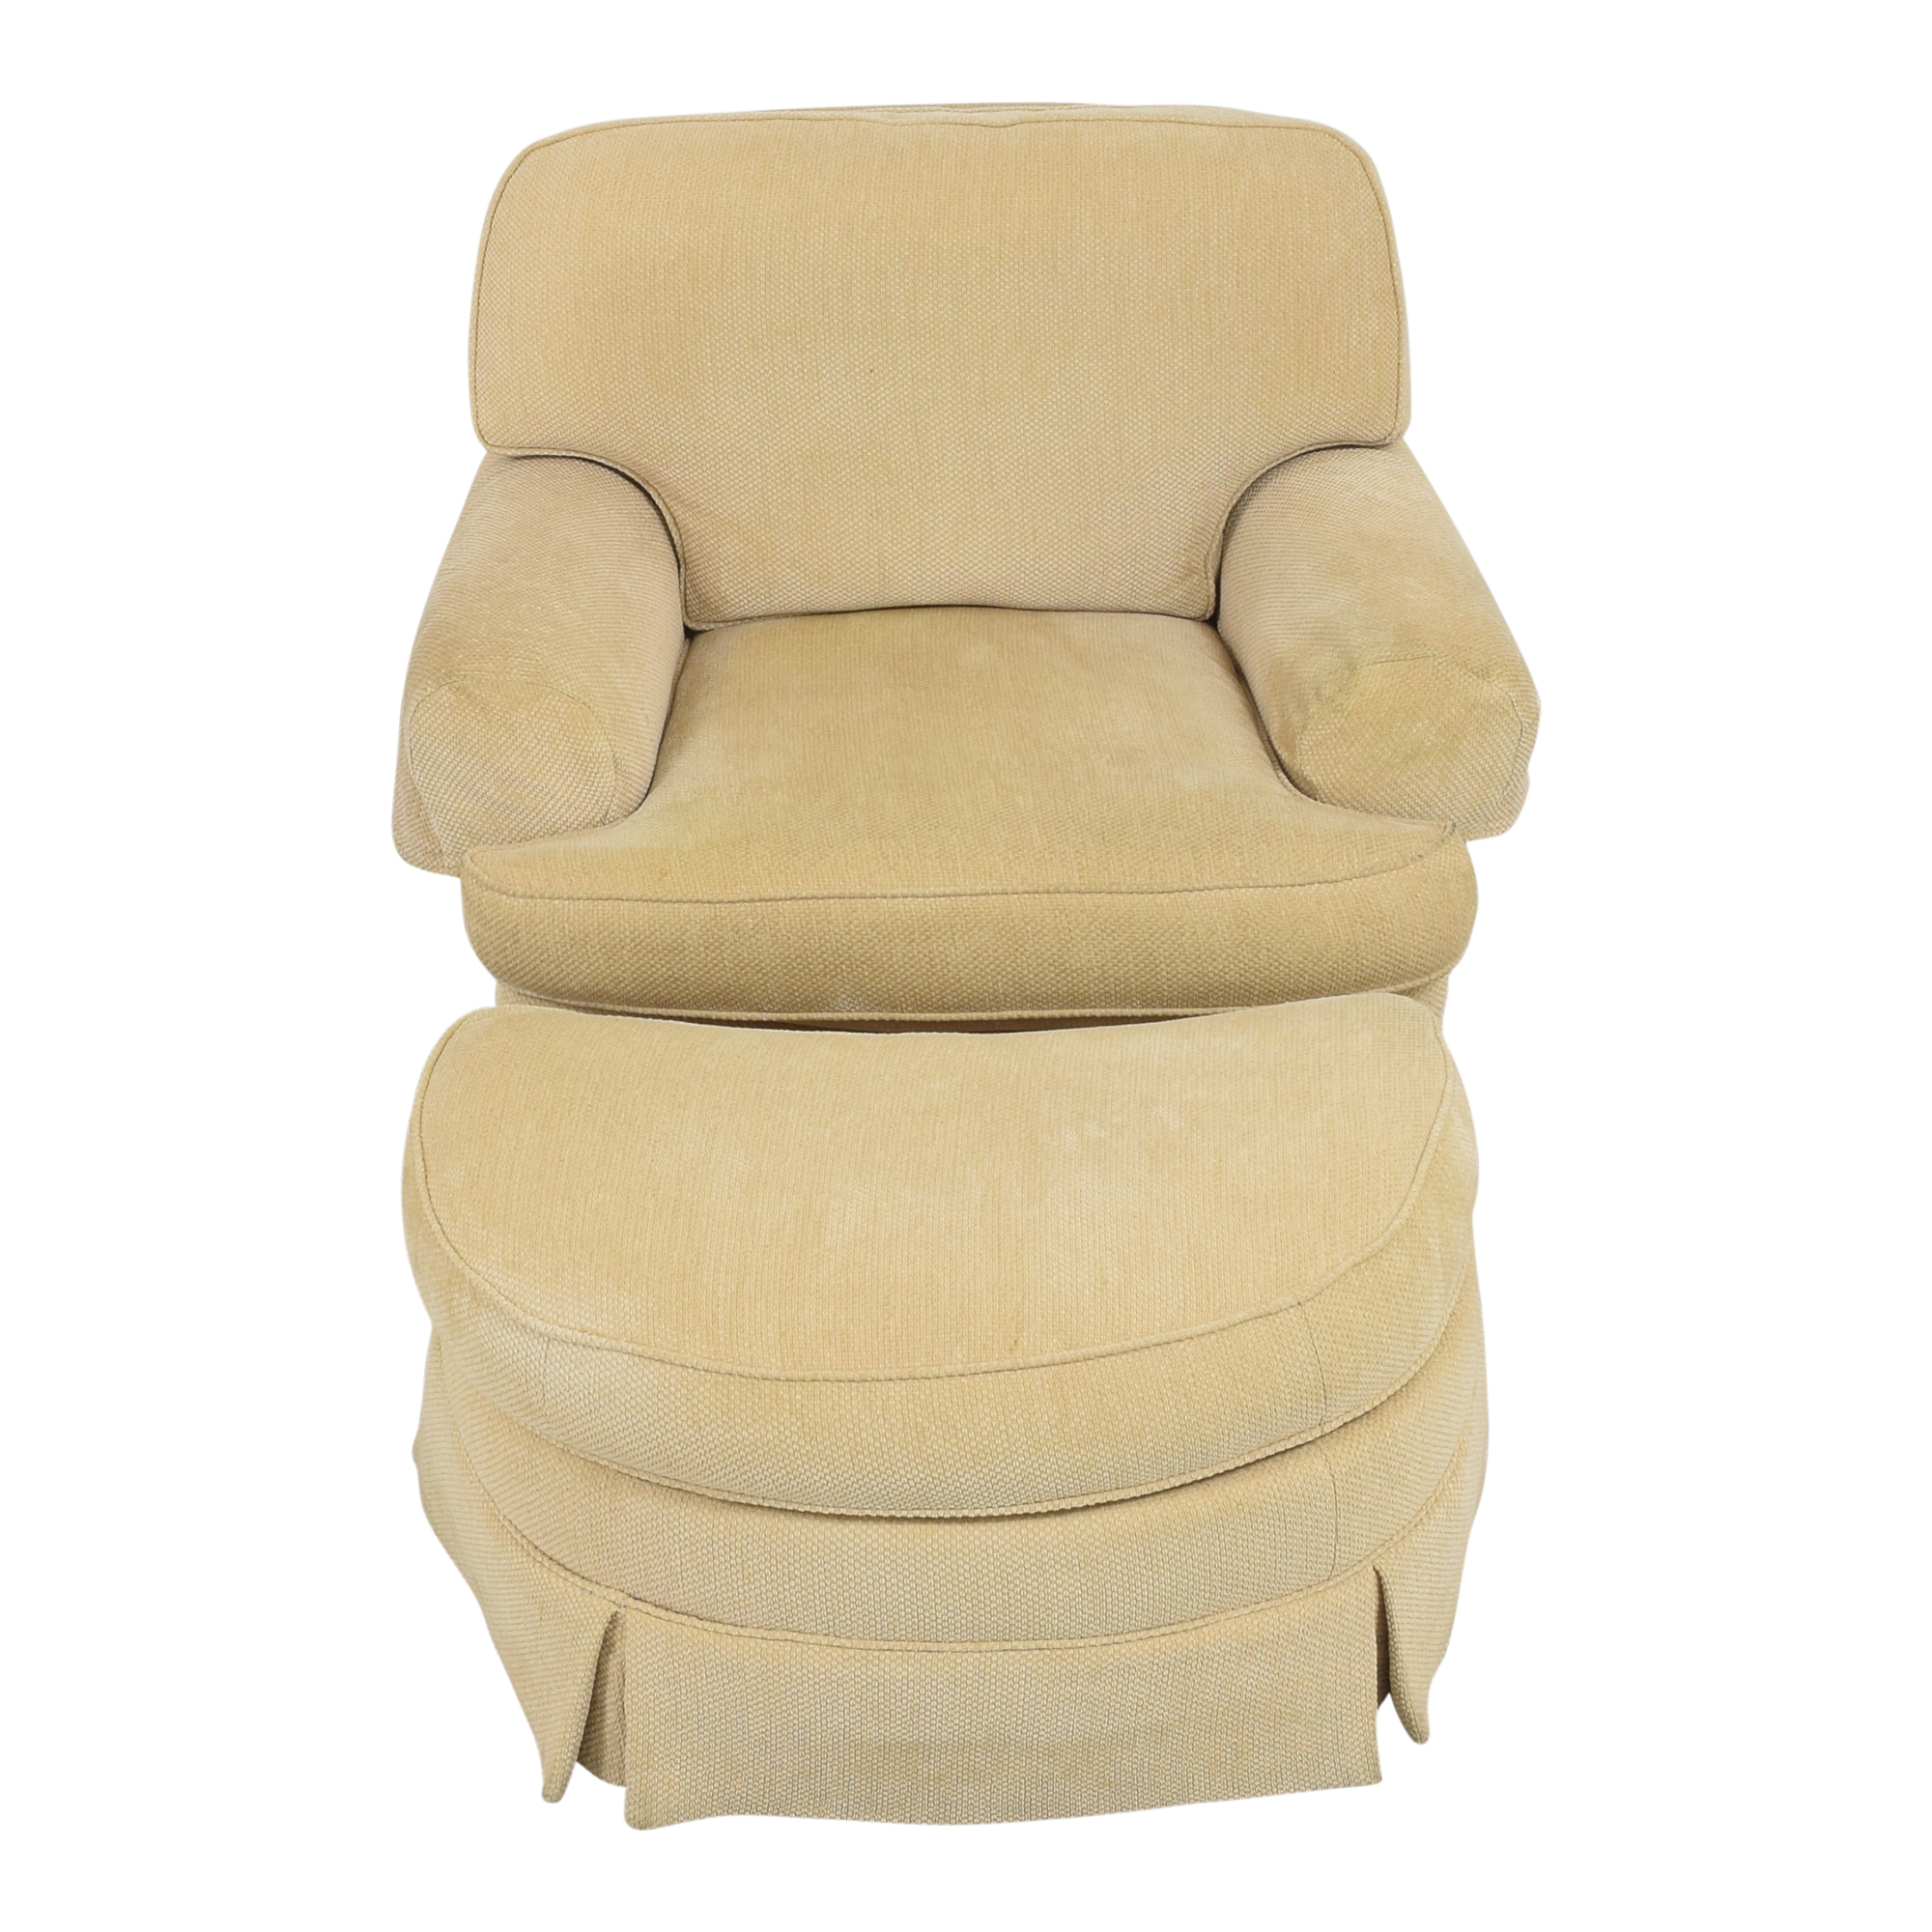 buy Ralph Lauren Home Chair with Ottoman Ralph Lauren Home Chairs